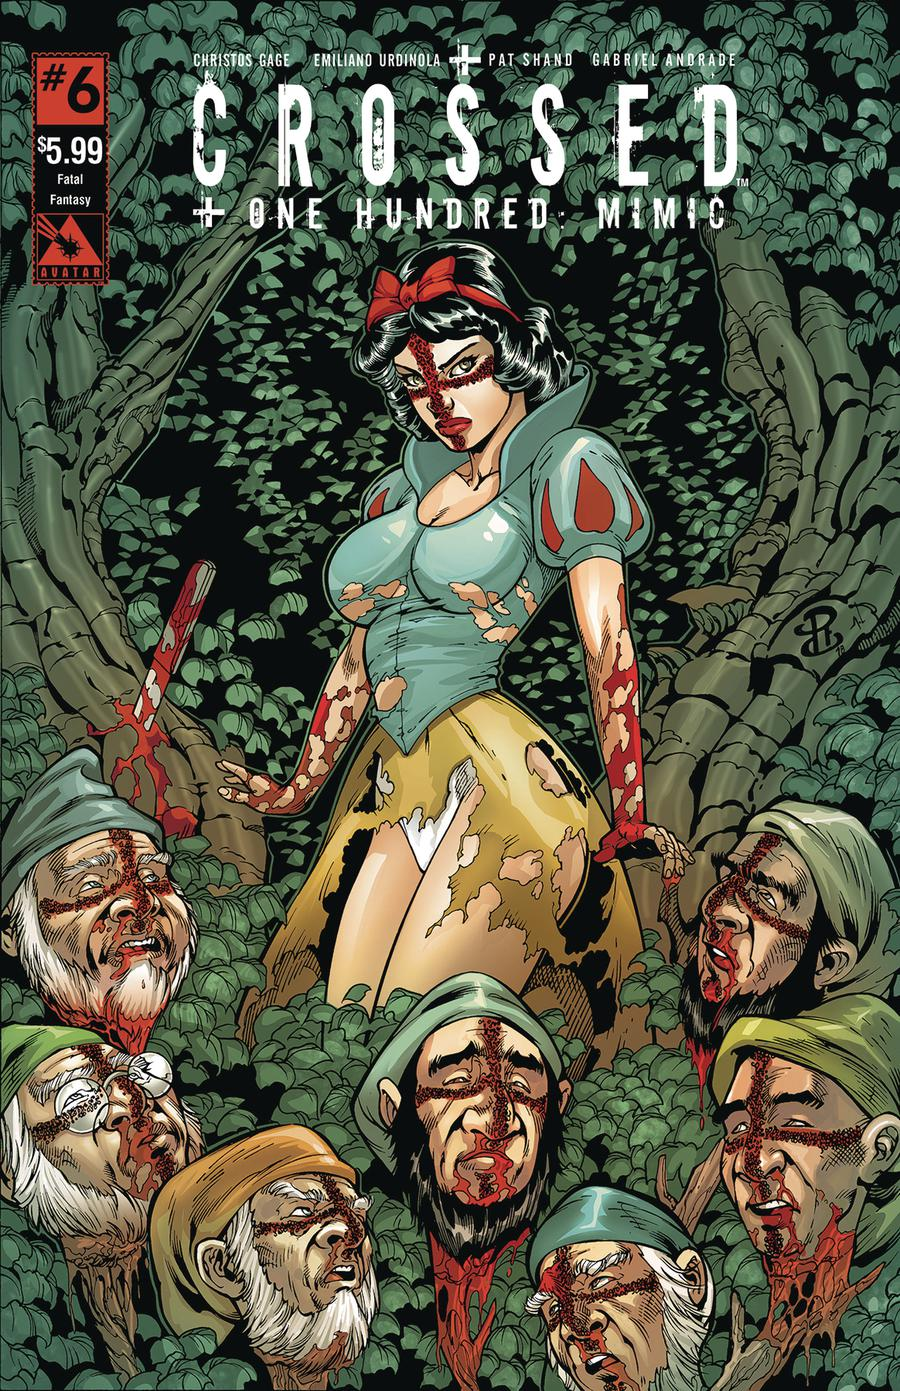 Crossed Plus 100 Mimic #6 Cover D Fatal Fantasy Cover